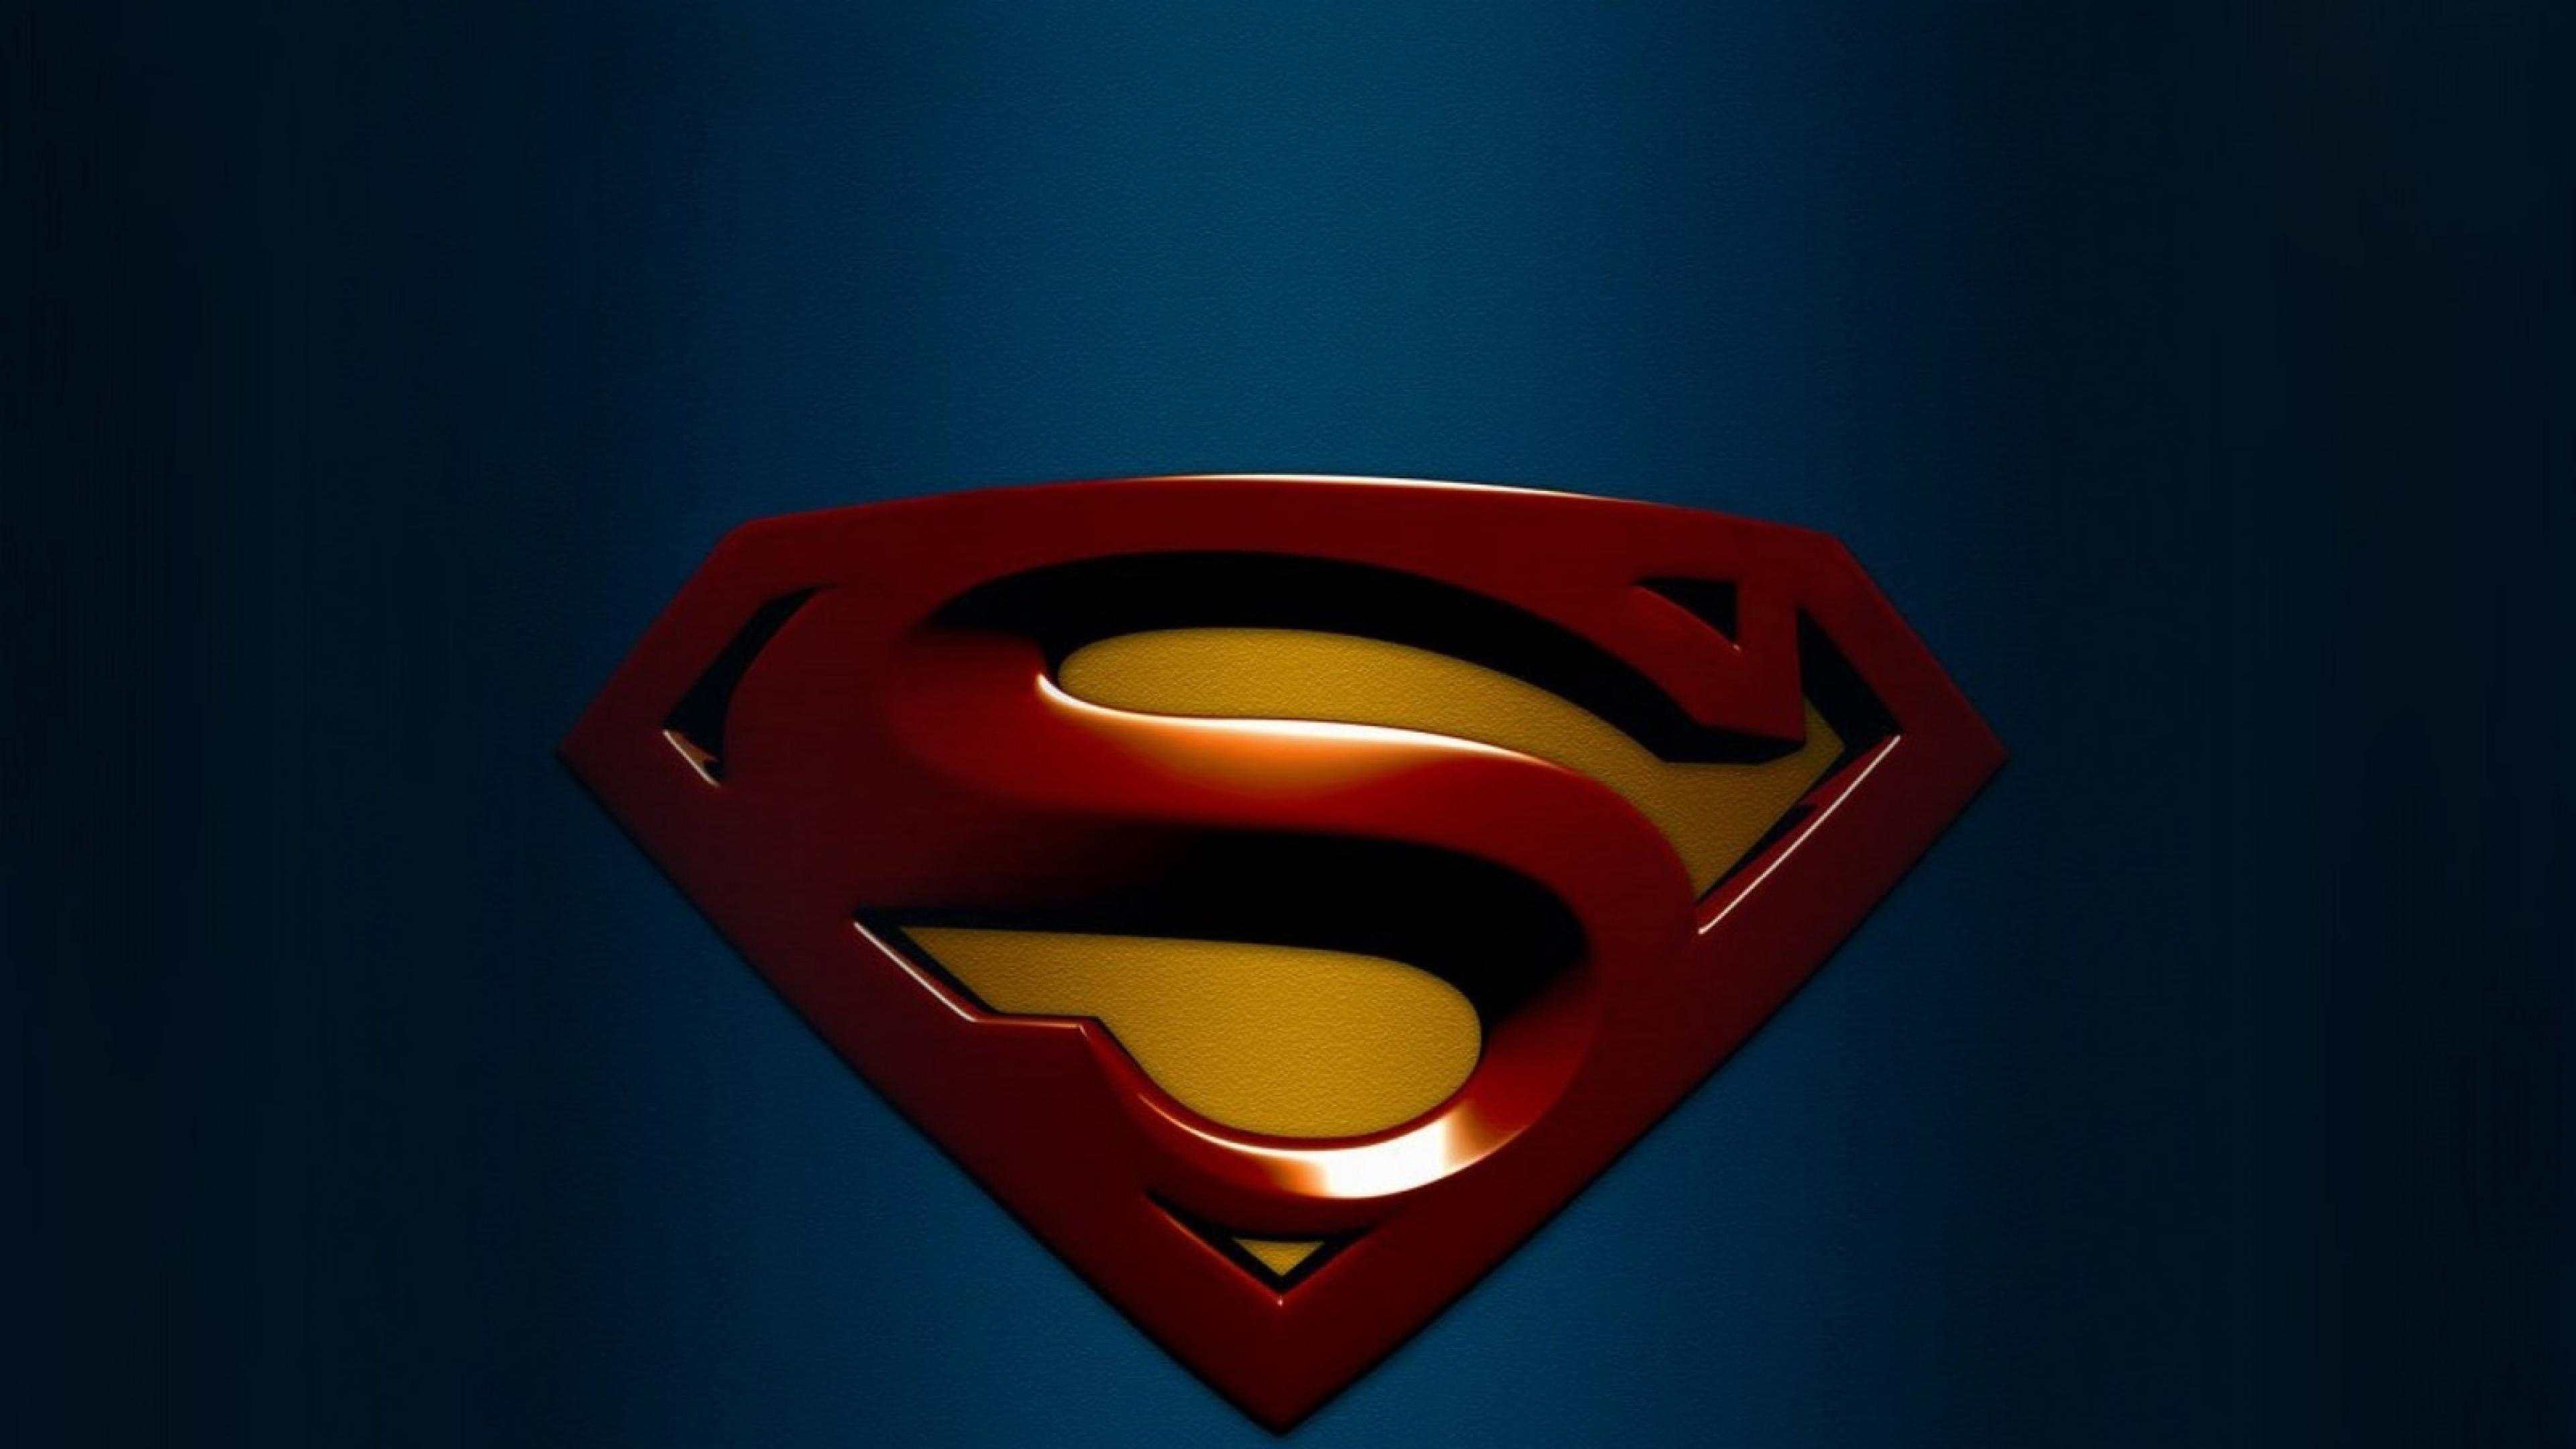 Download Wallpaper 3840x2160 superman blue background logo 4K Ultra 3840x2160